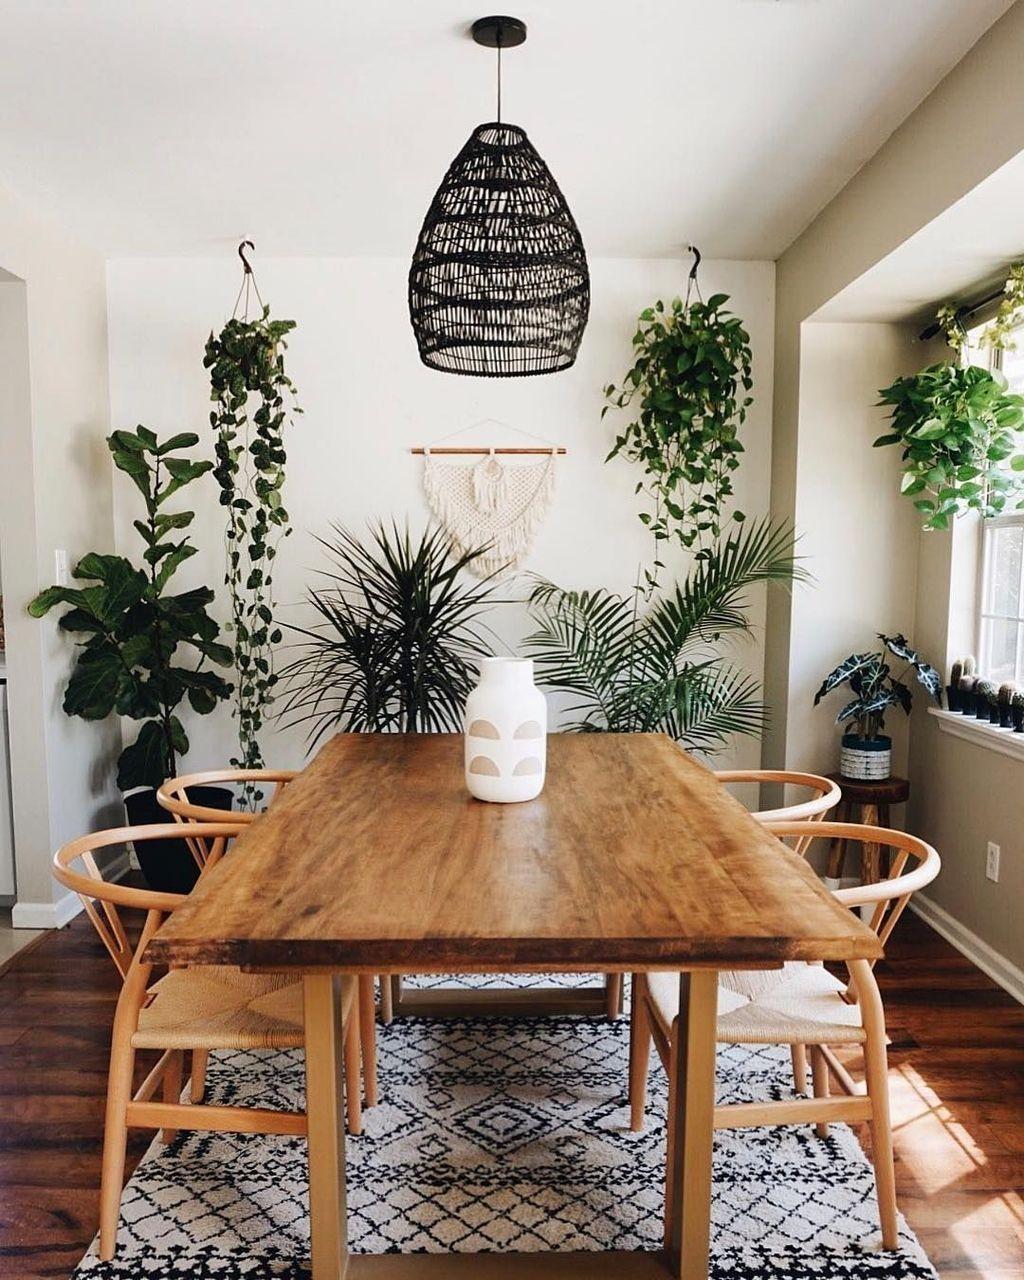 20 Unordinary Dining Room Design Ideas With Bohemian Style Boho Dining Room Dining Room Design Dining Room Inspiration